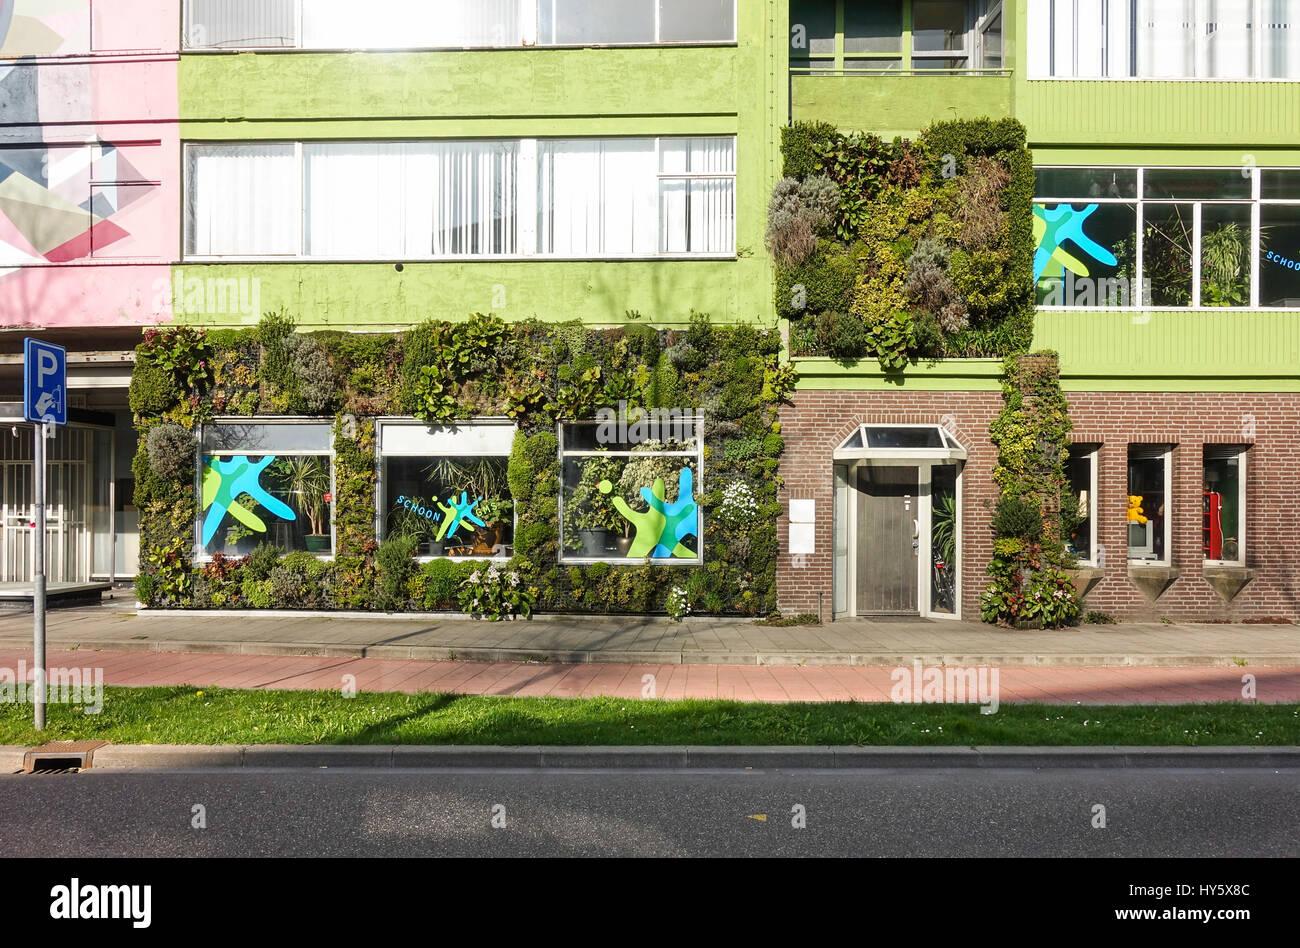 Design house heerlen - Stock Photo Walls Of Company Covered With Plants Living Wall Heerlen Netherlands